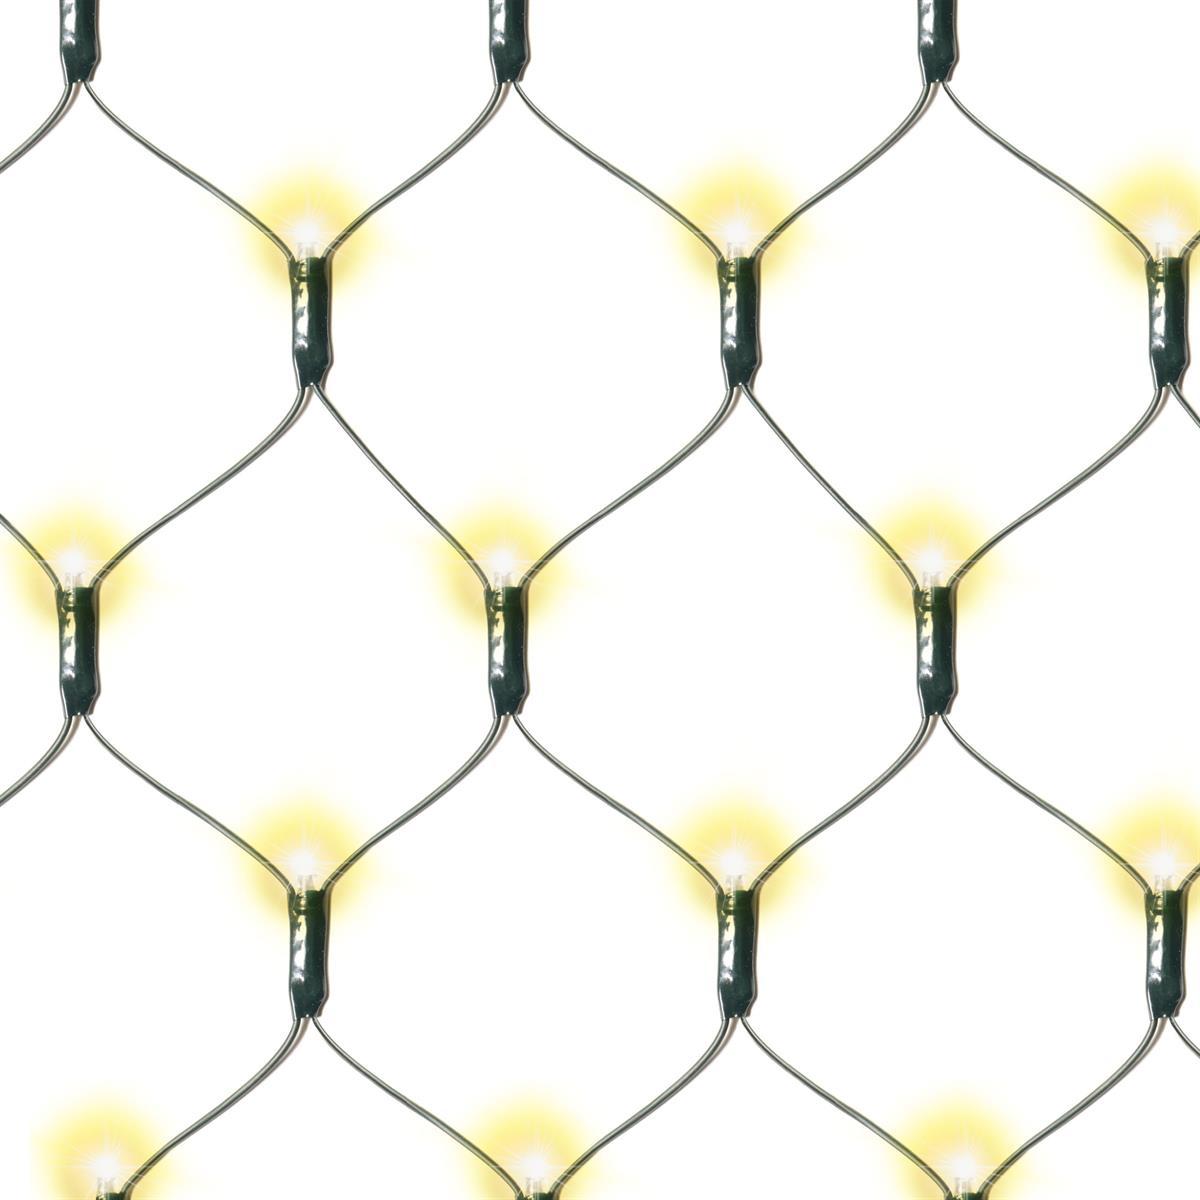 181 LED Lichternetz Solar warmweiß Pavillon Beleuchtung 3x3m Blinkfunktion